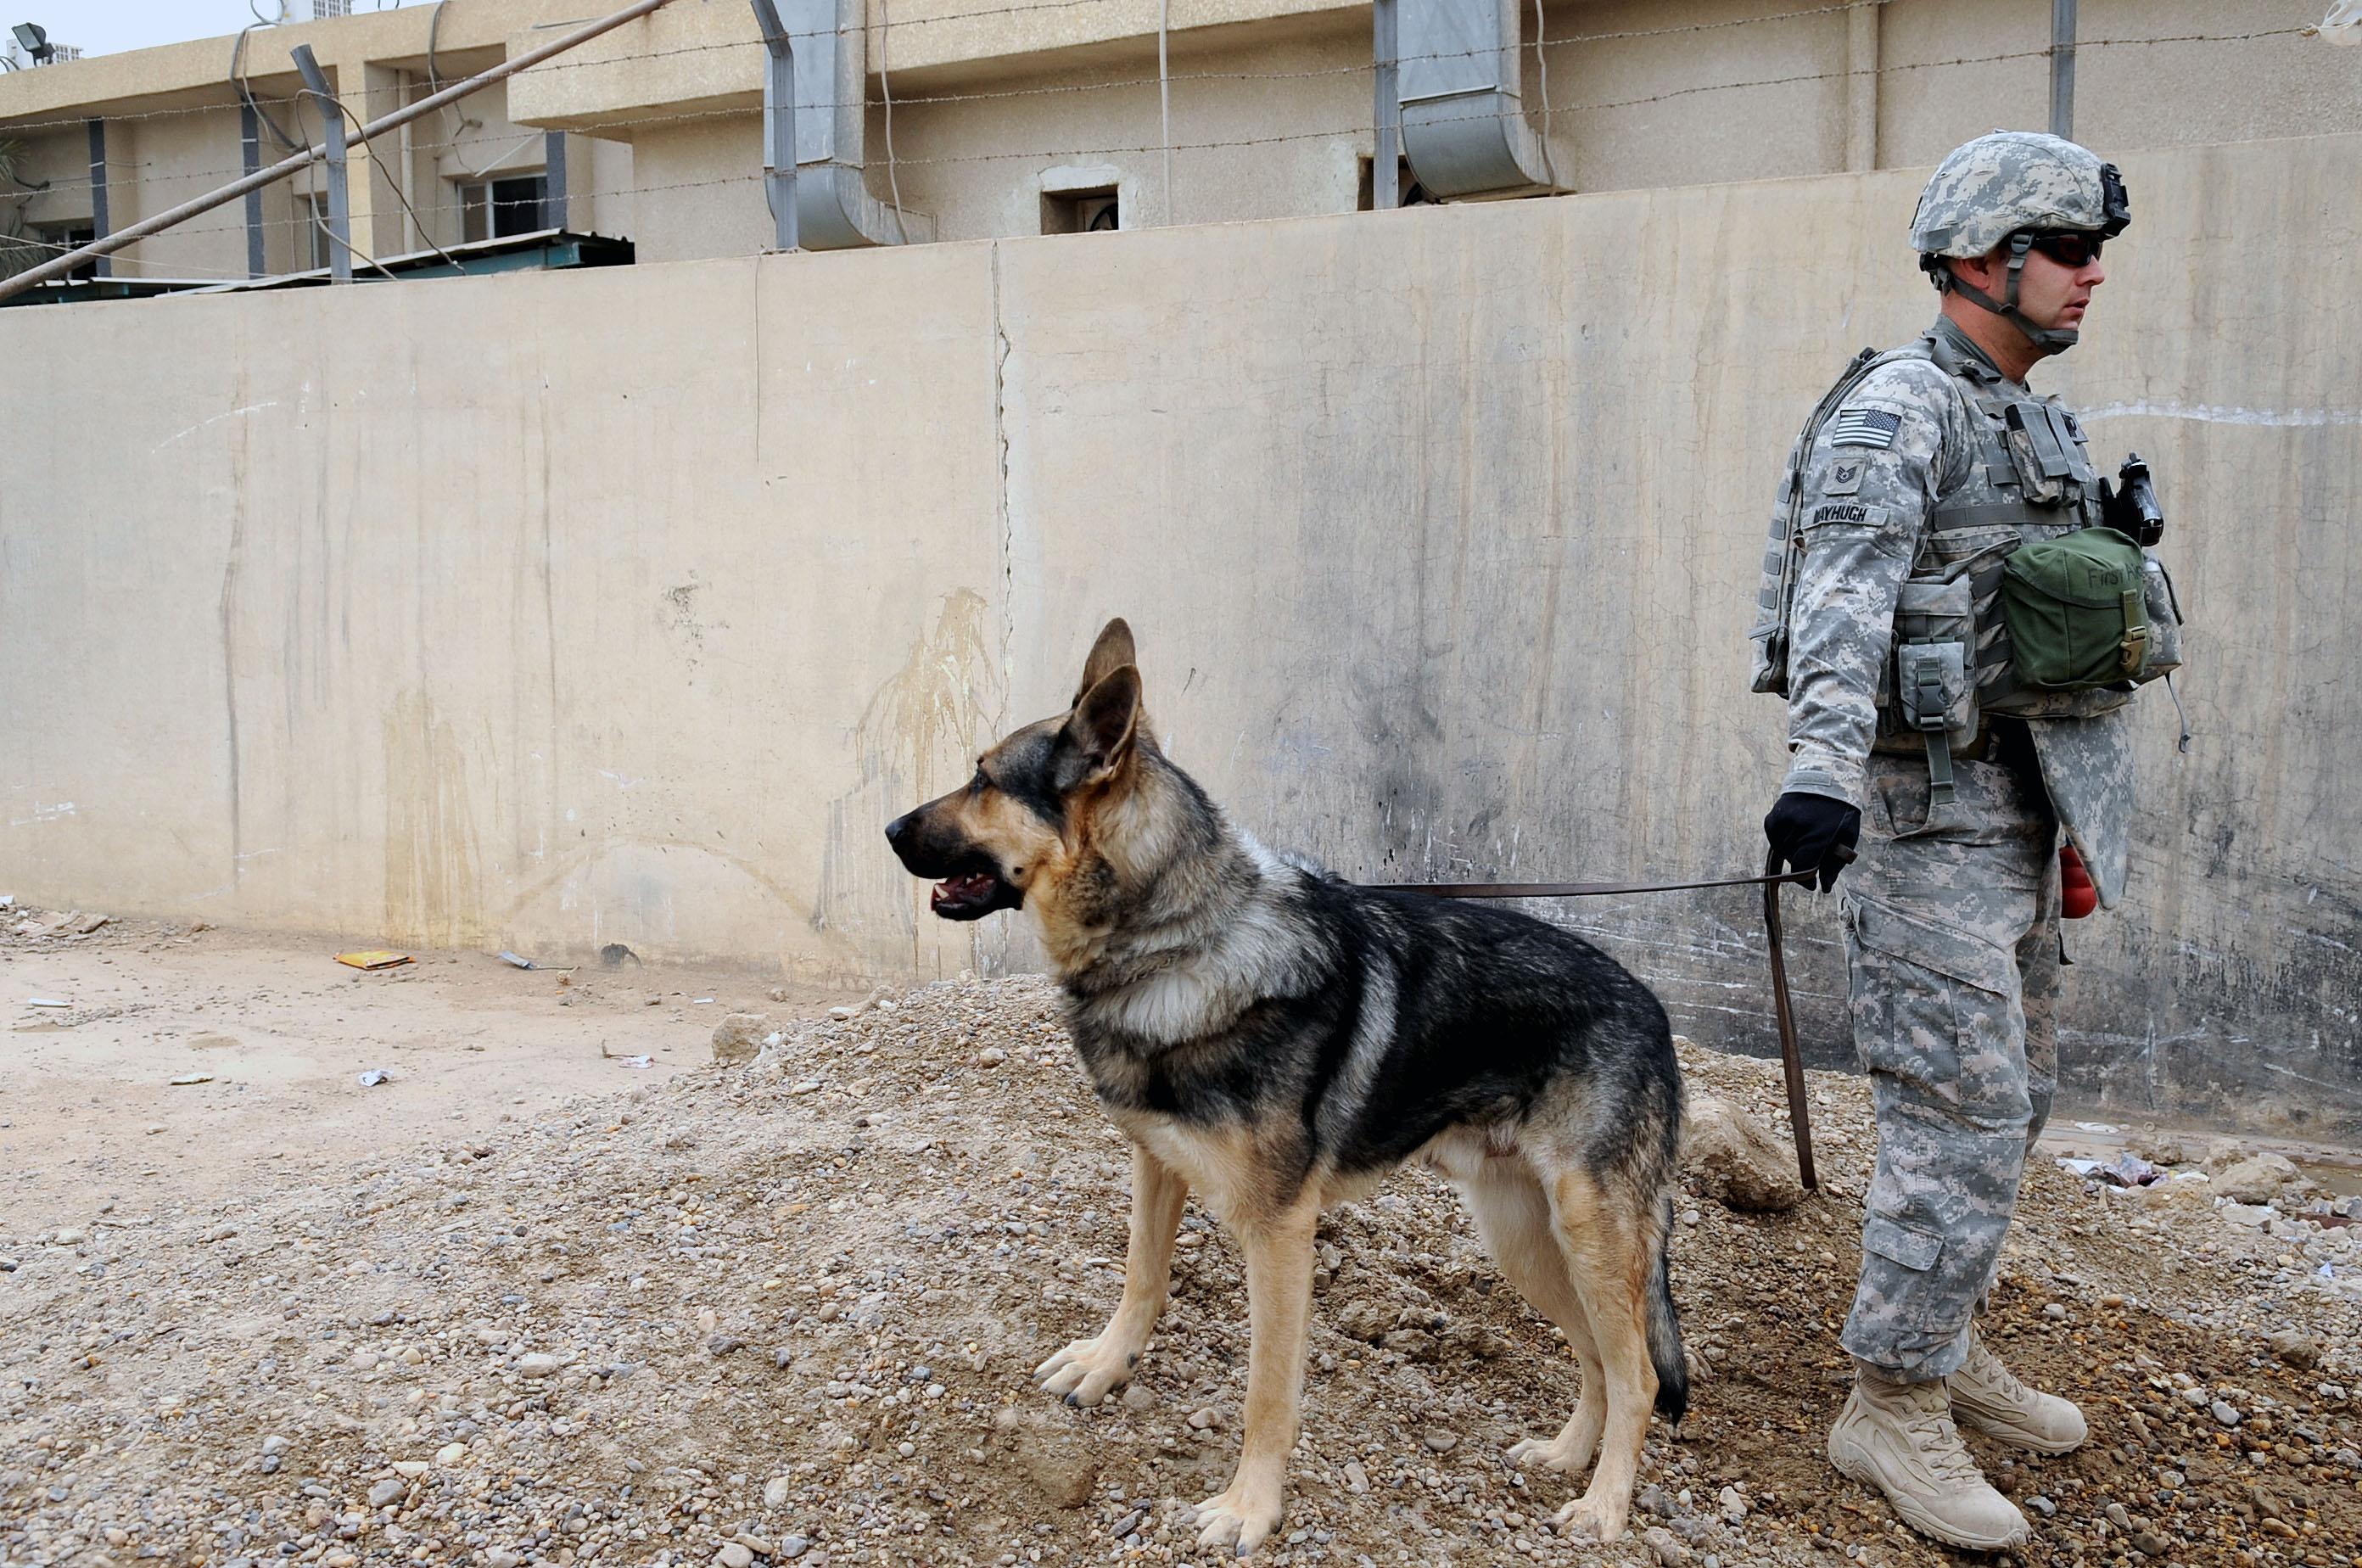 Ceremony for renovations to the Alwaiya Maternity Hospital in Muhallah 902 DVIDS174242.jpg English: U.S. Air Force Tech. Sgt. Mayhugh, a dog